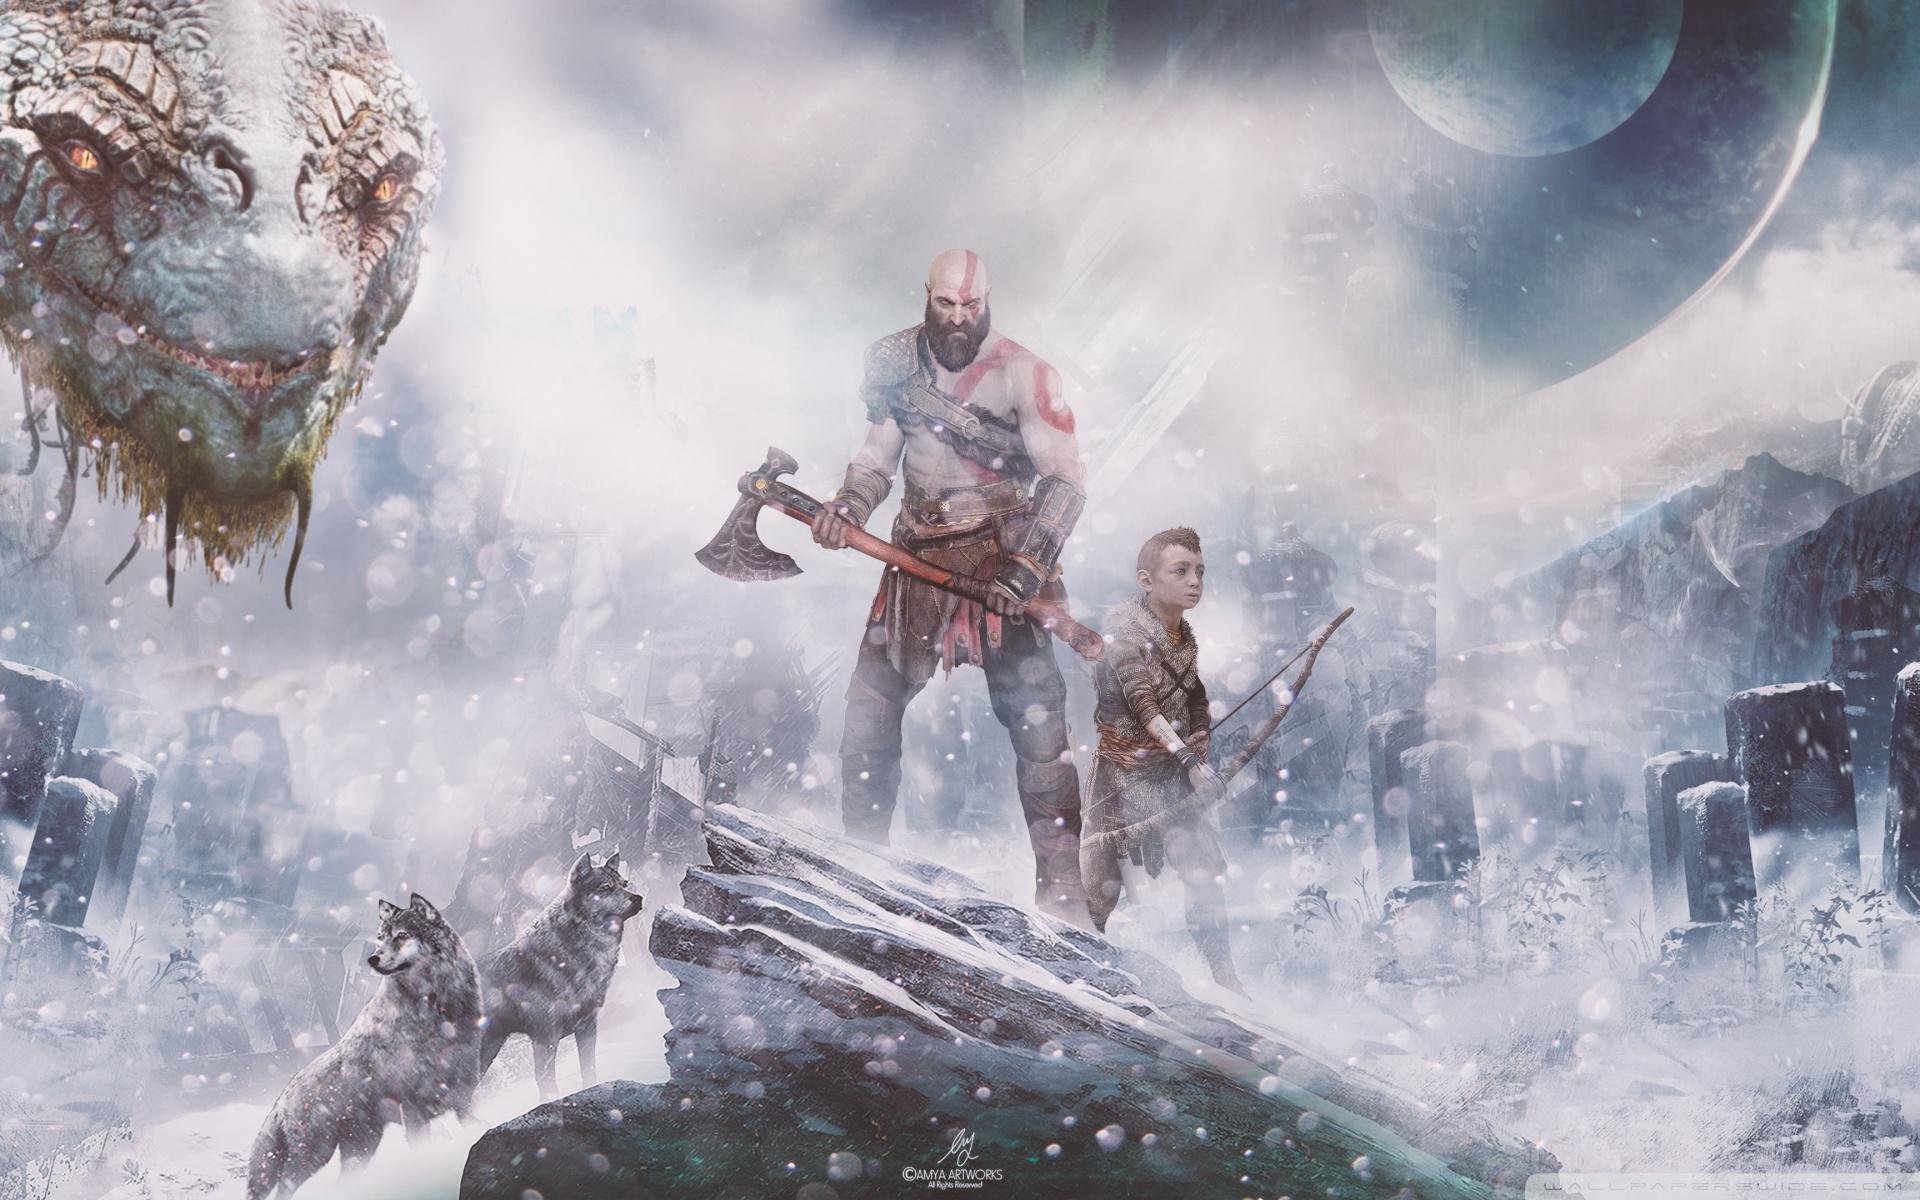 God of war، PC،عرضه نسخه PC بازی God of War